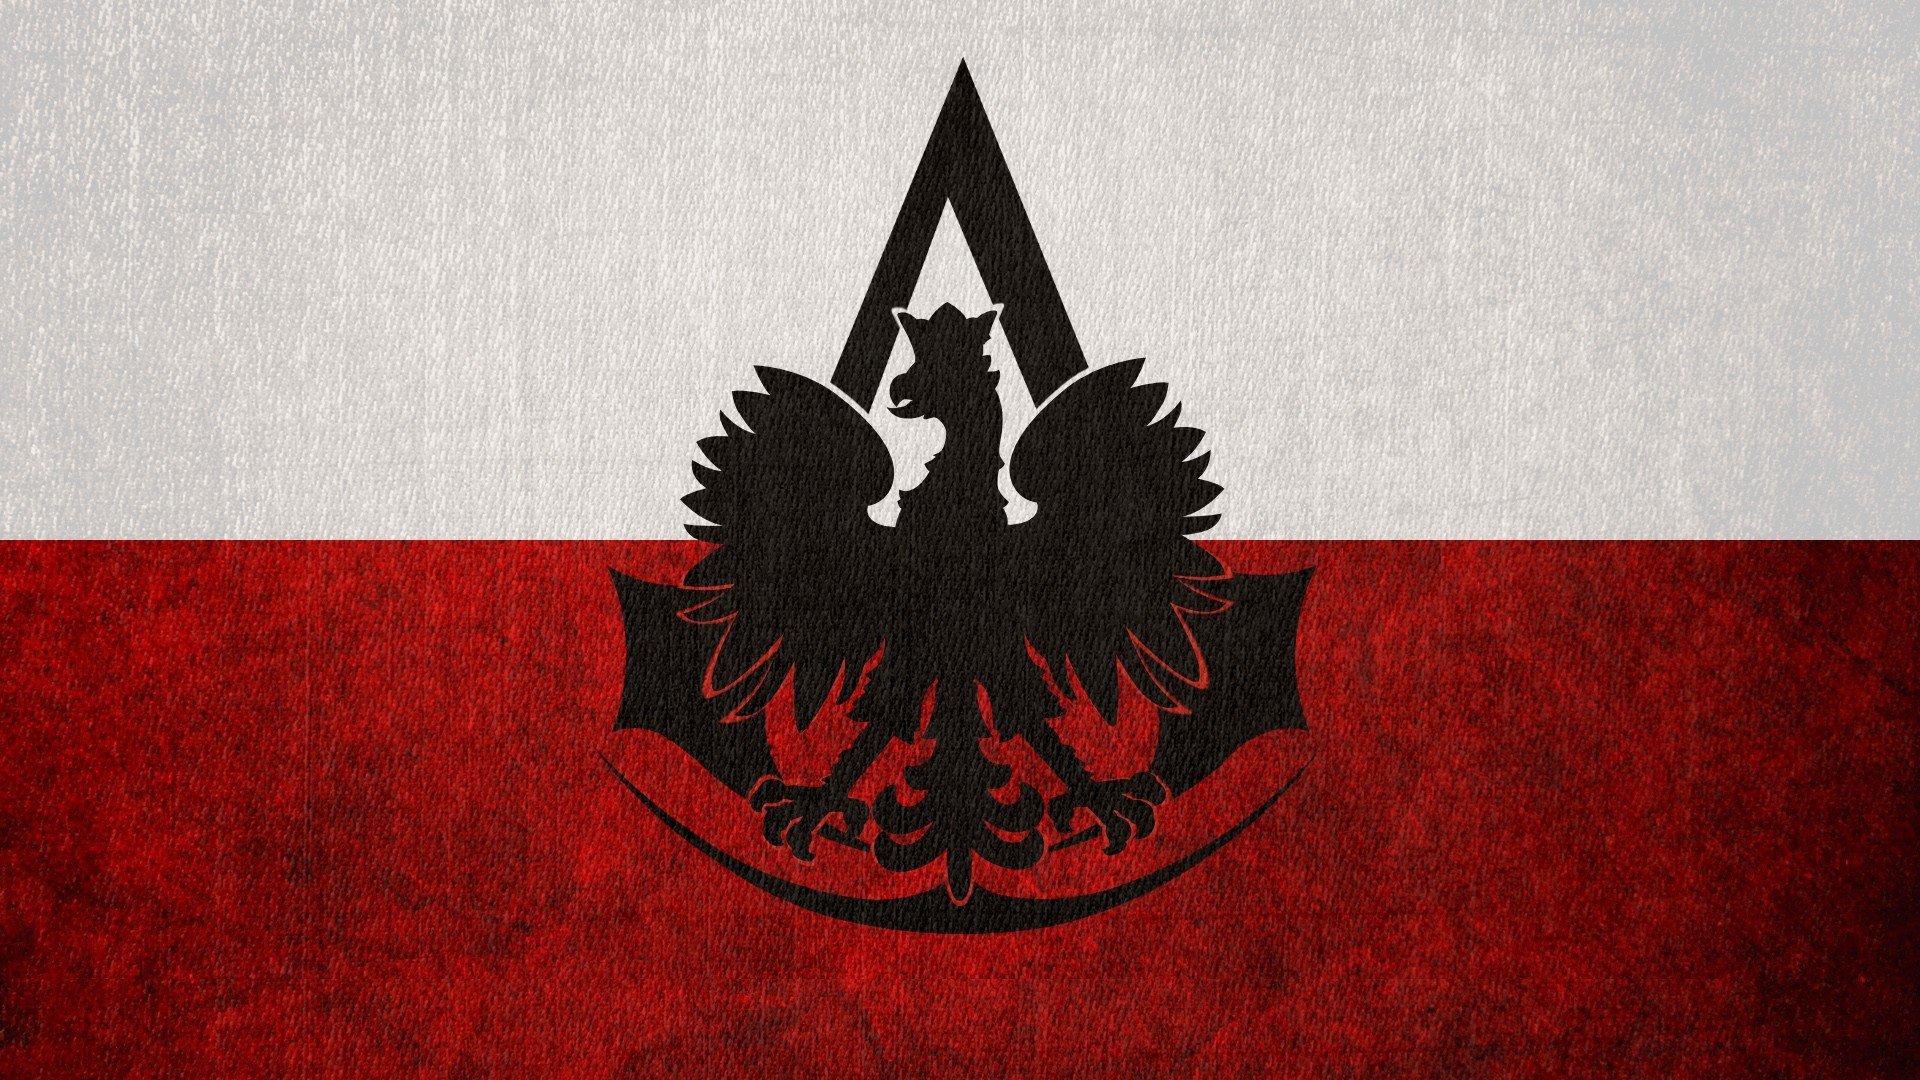 Assassins Creed flags Poland logos Polish Flag Polish eagle 1920x1080